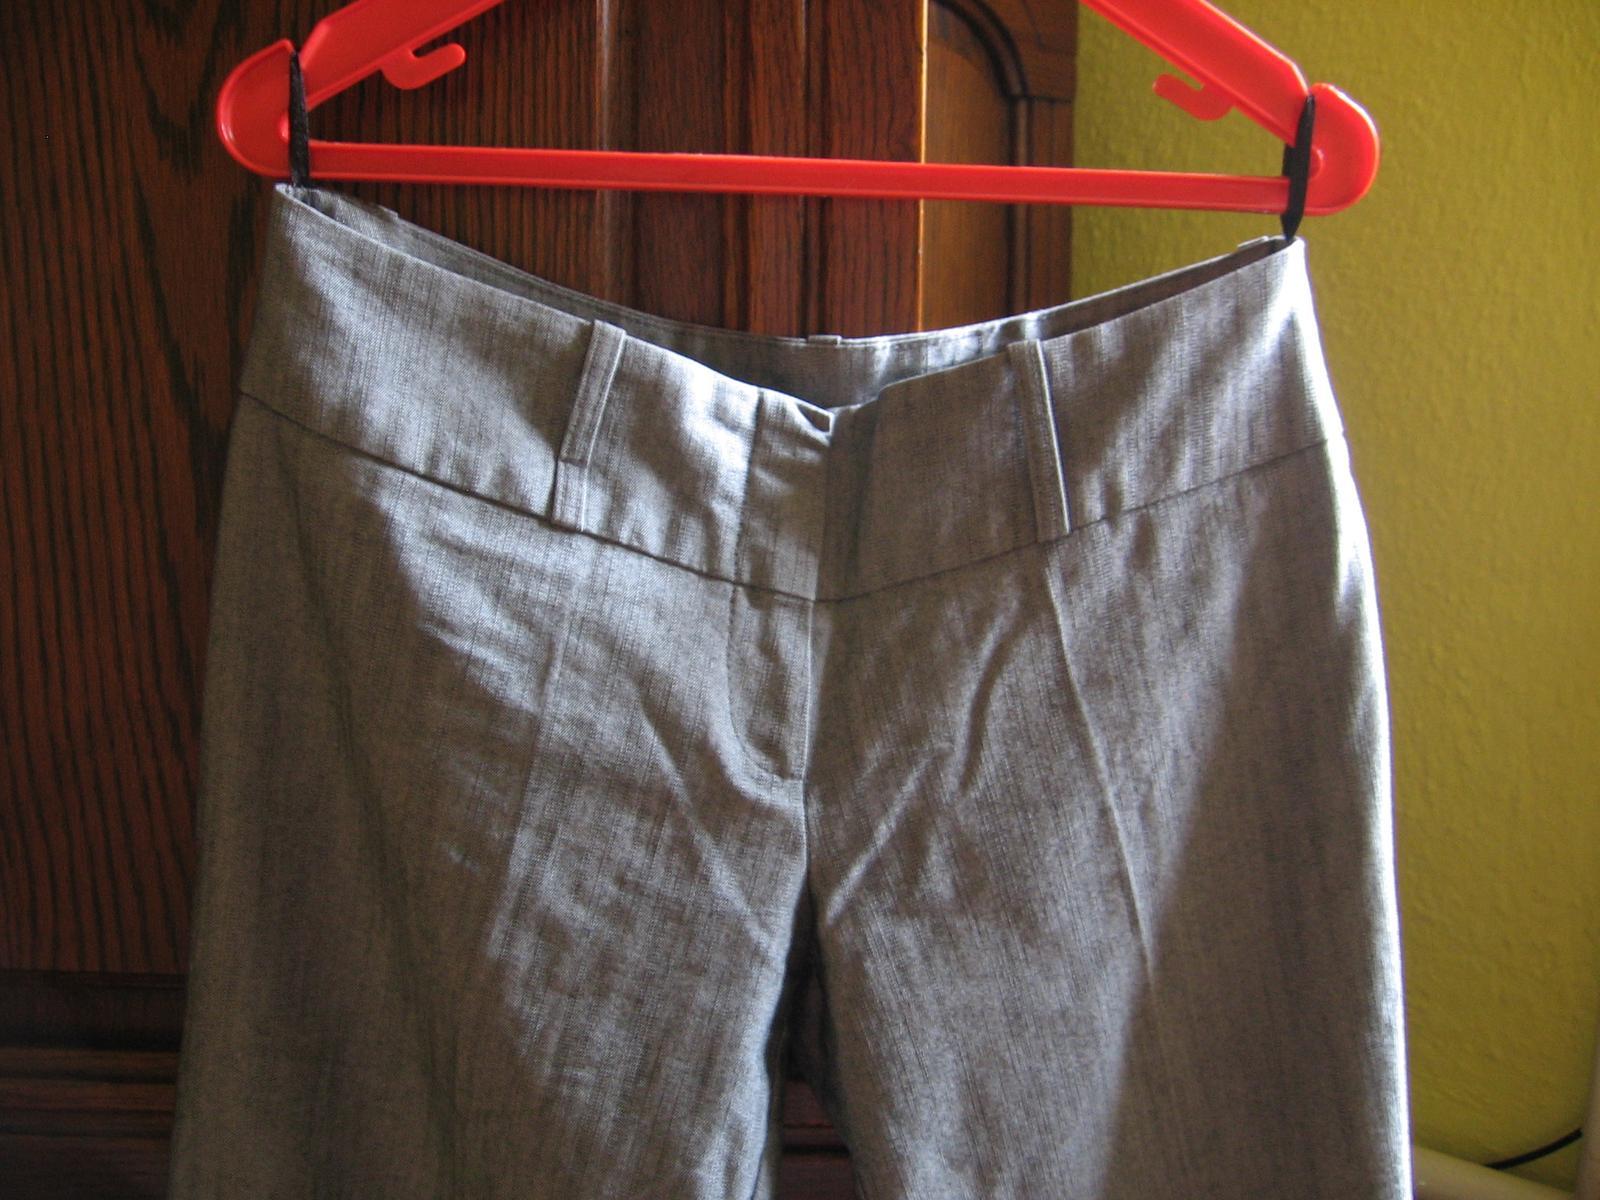 f2a49db06927 Sedy biznis kostym - 3 kombinacia